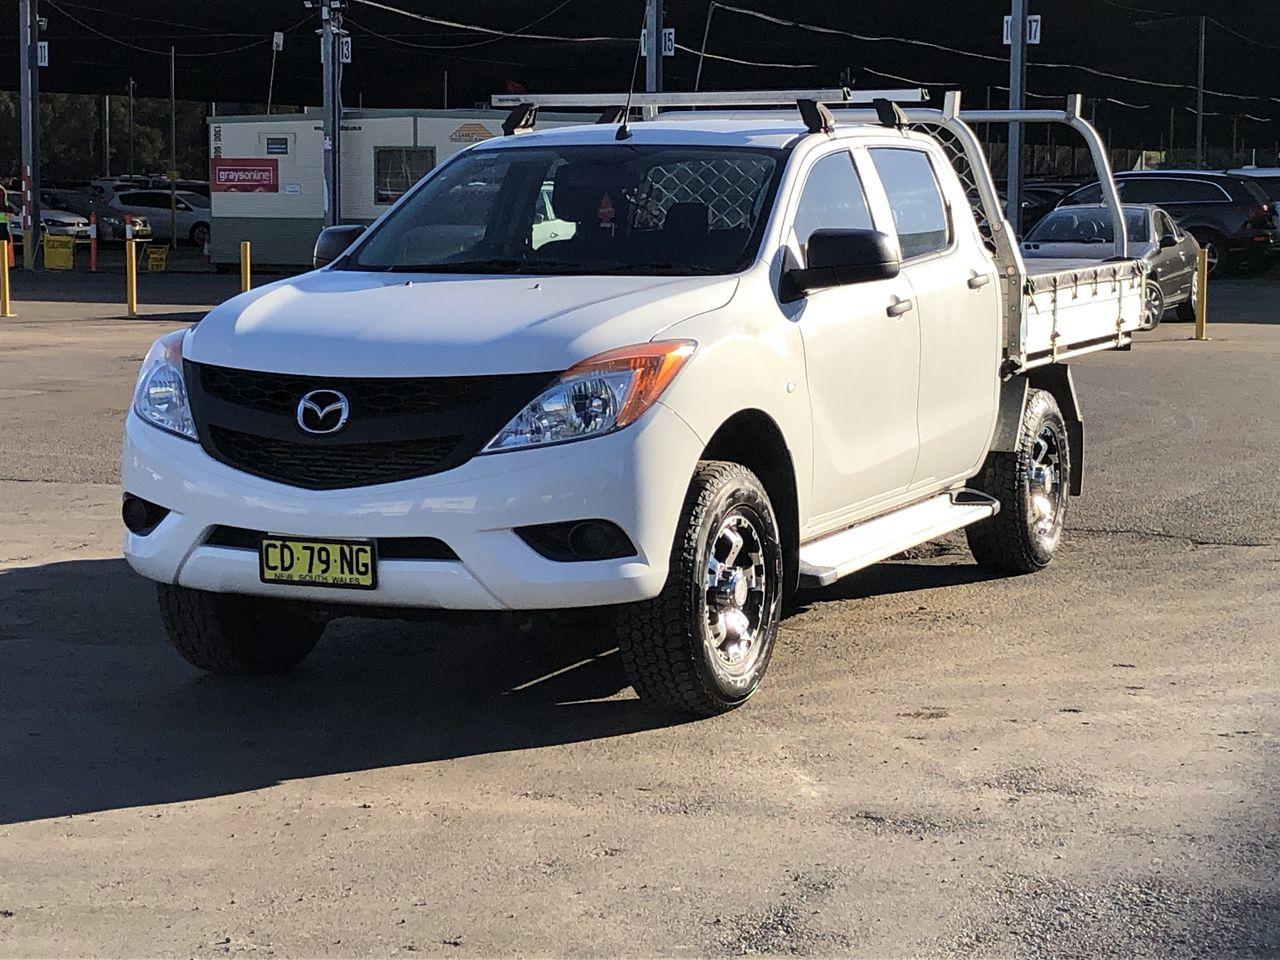 2015 Mazda BT-50 4X2 XT Turbo Diesel Manual Crew Cab Chassis